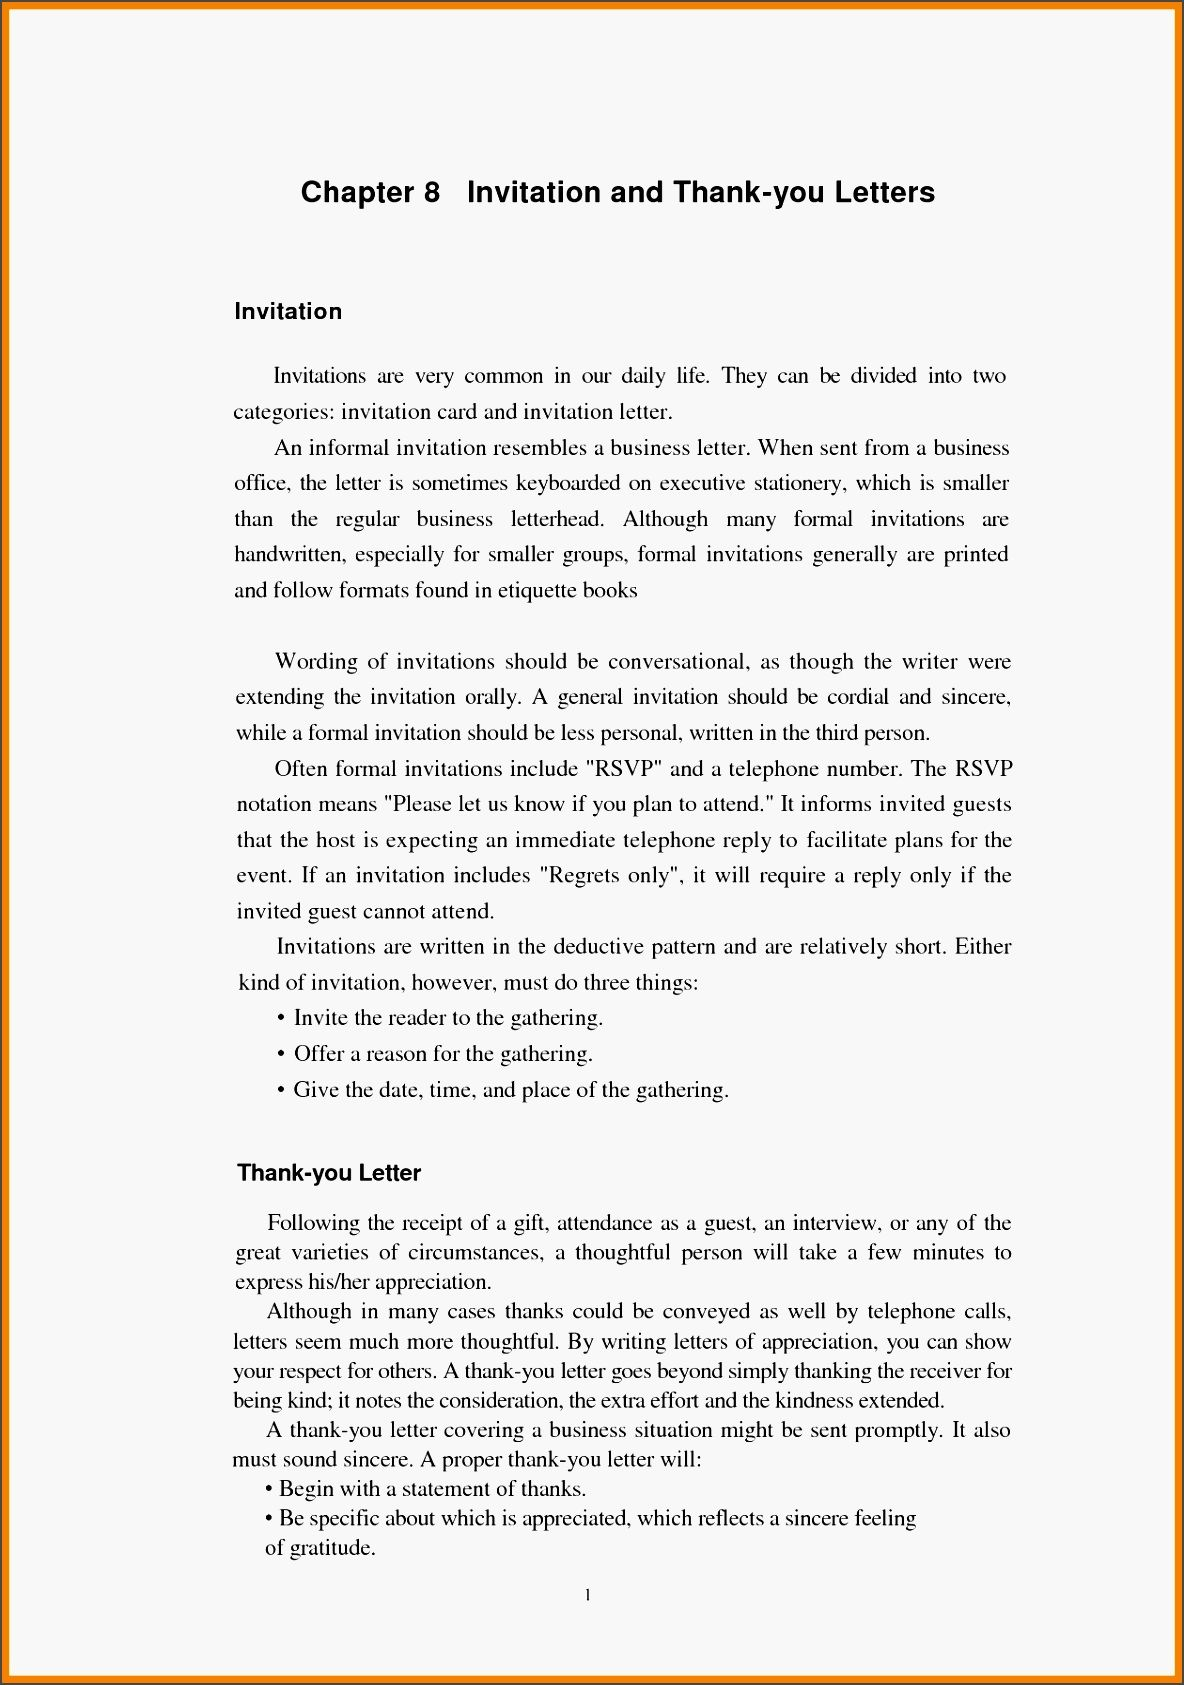 Example of formal and informal invitation card rezzasite invitation letter informal jkkpd elegant 9 formal stopboris Image collections